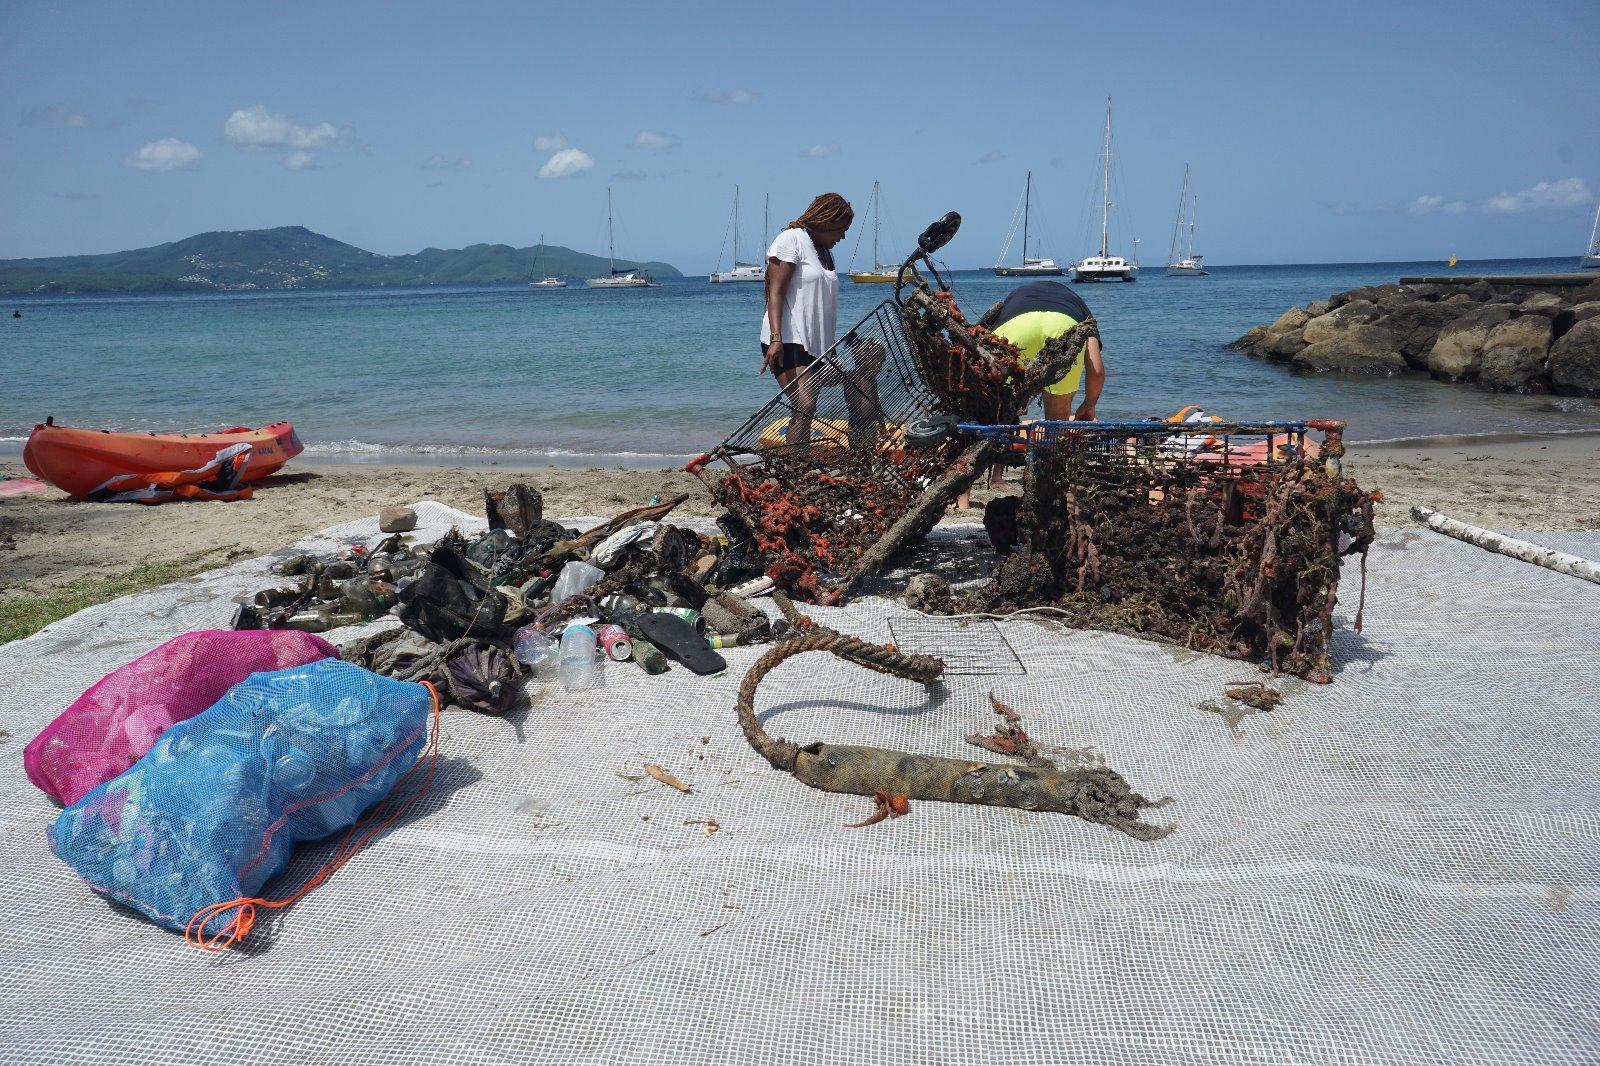 Grand nettoyage de la baie de Fort-de-France, ce samedi